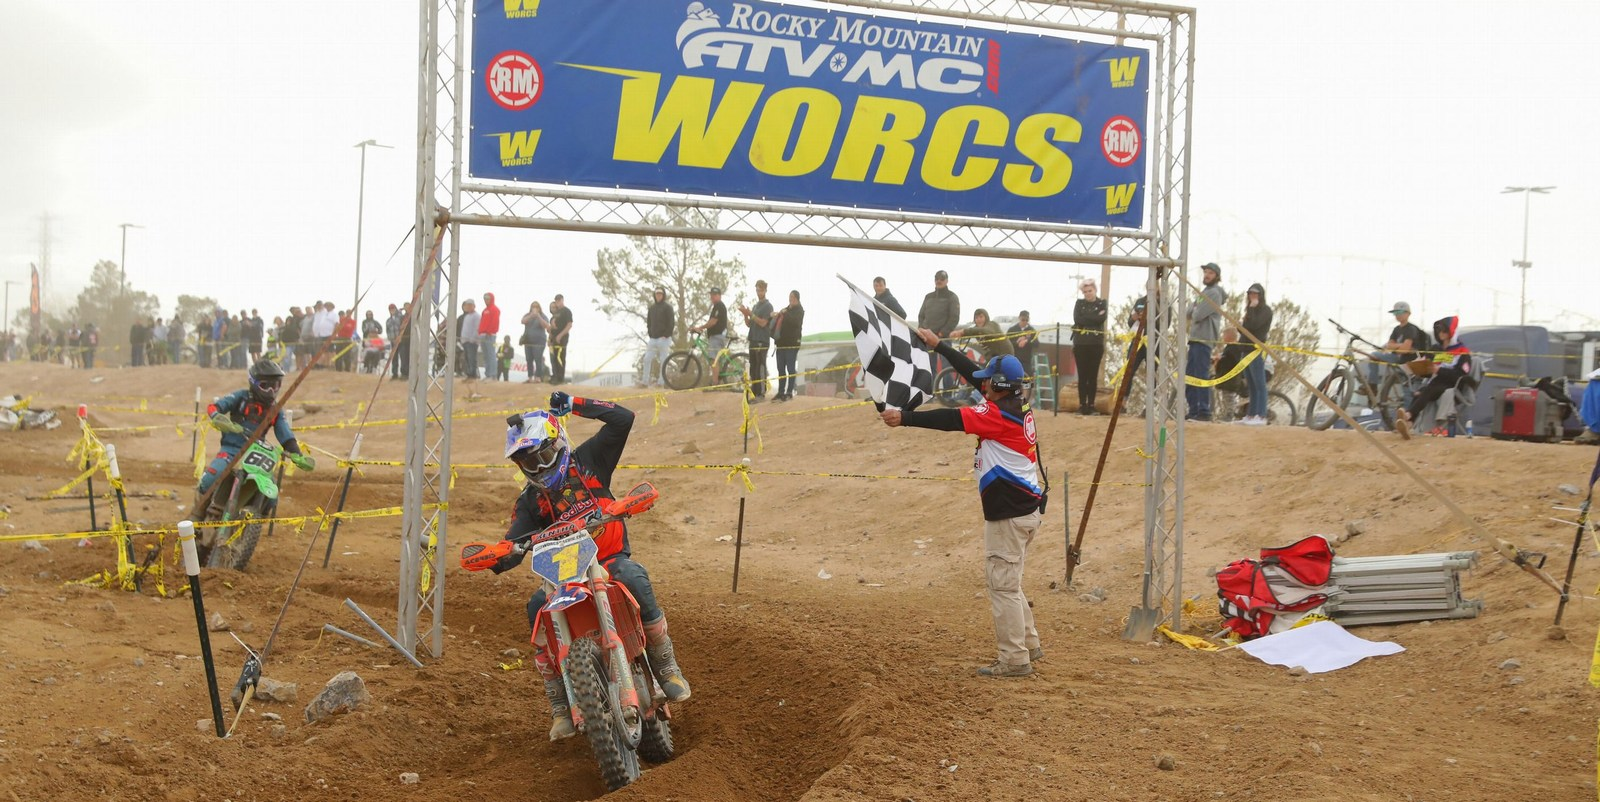 2020-01-taylor-robert-win-bike-worcs-racing